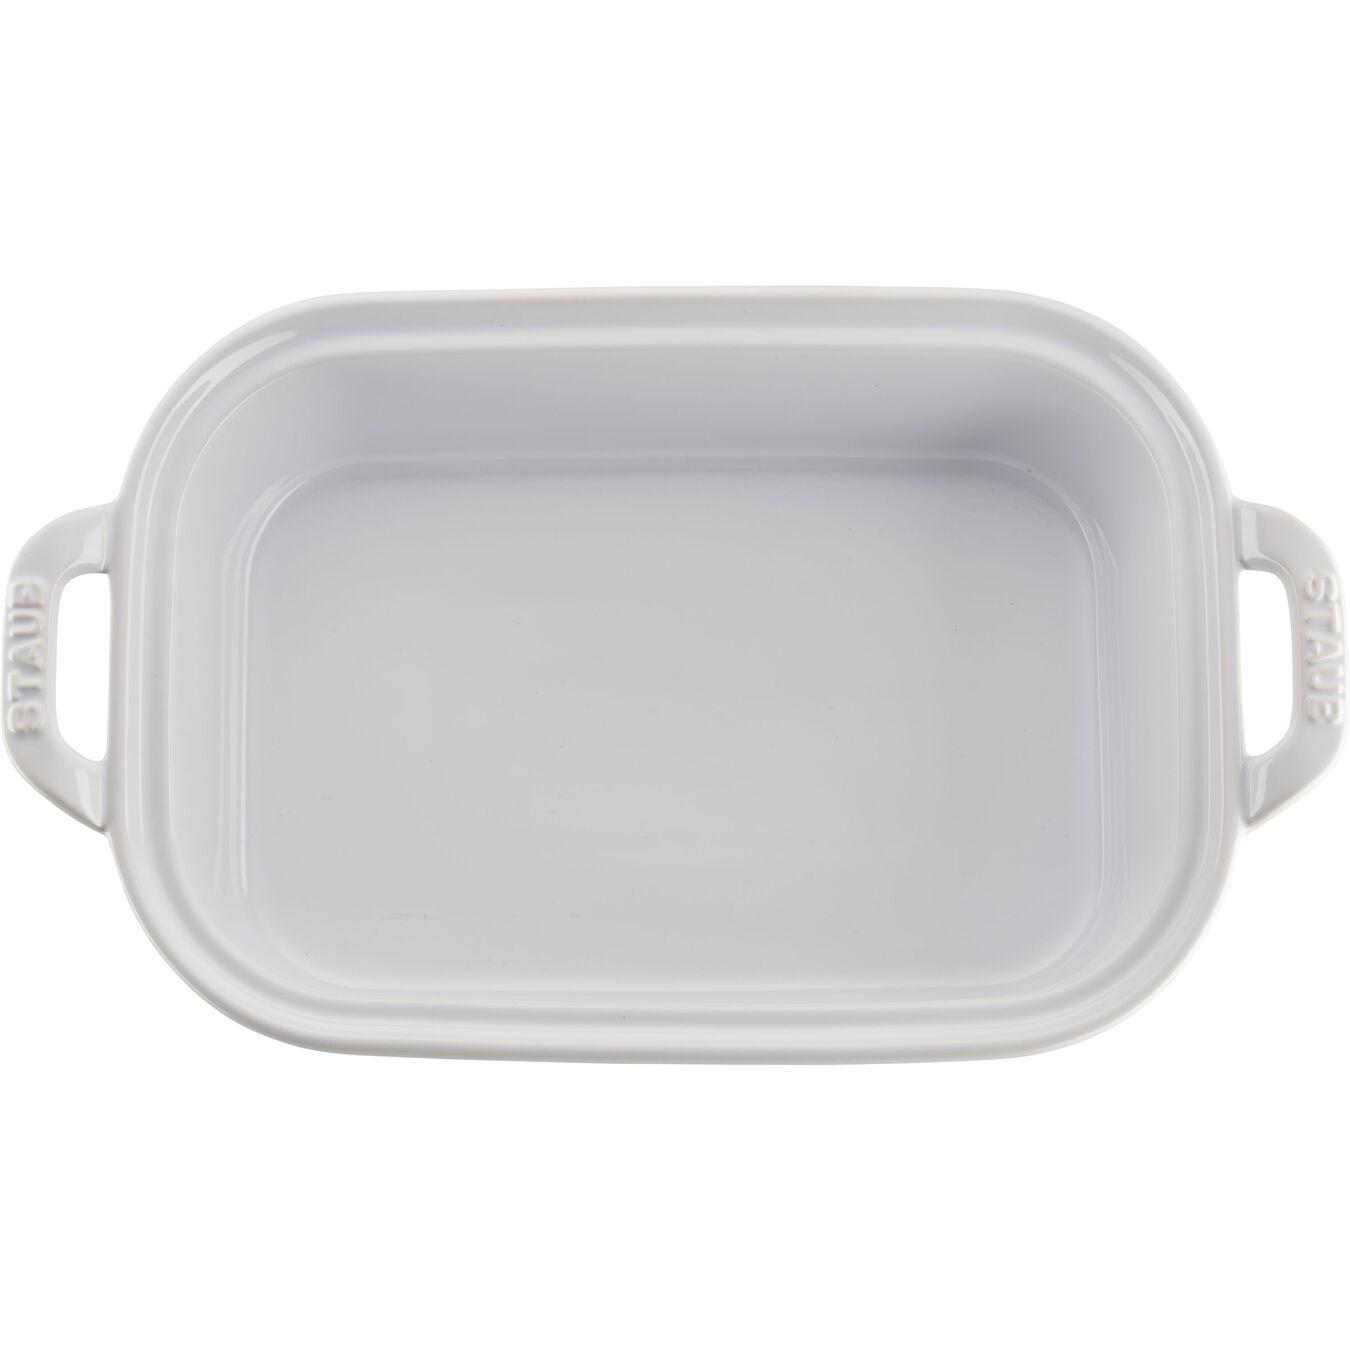 rectangular, Special shape bakeware, white,,large 3